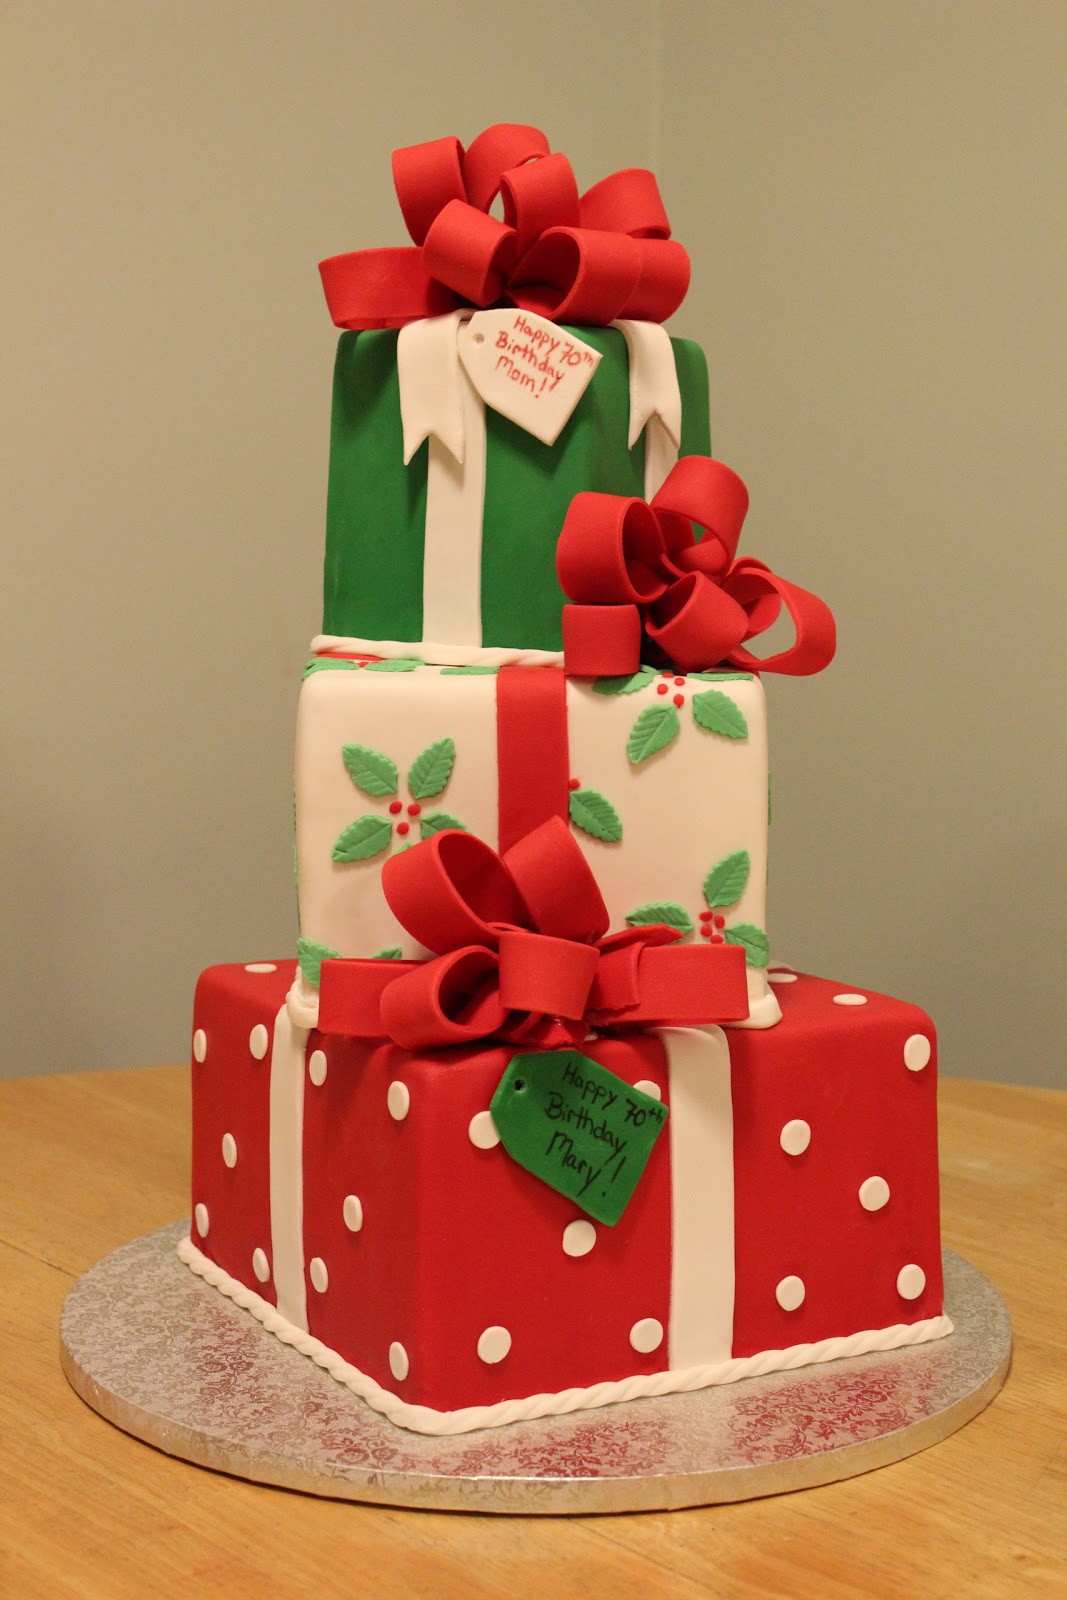 The Red-Headed Baker: Christmas Present Box Cake